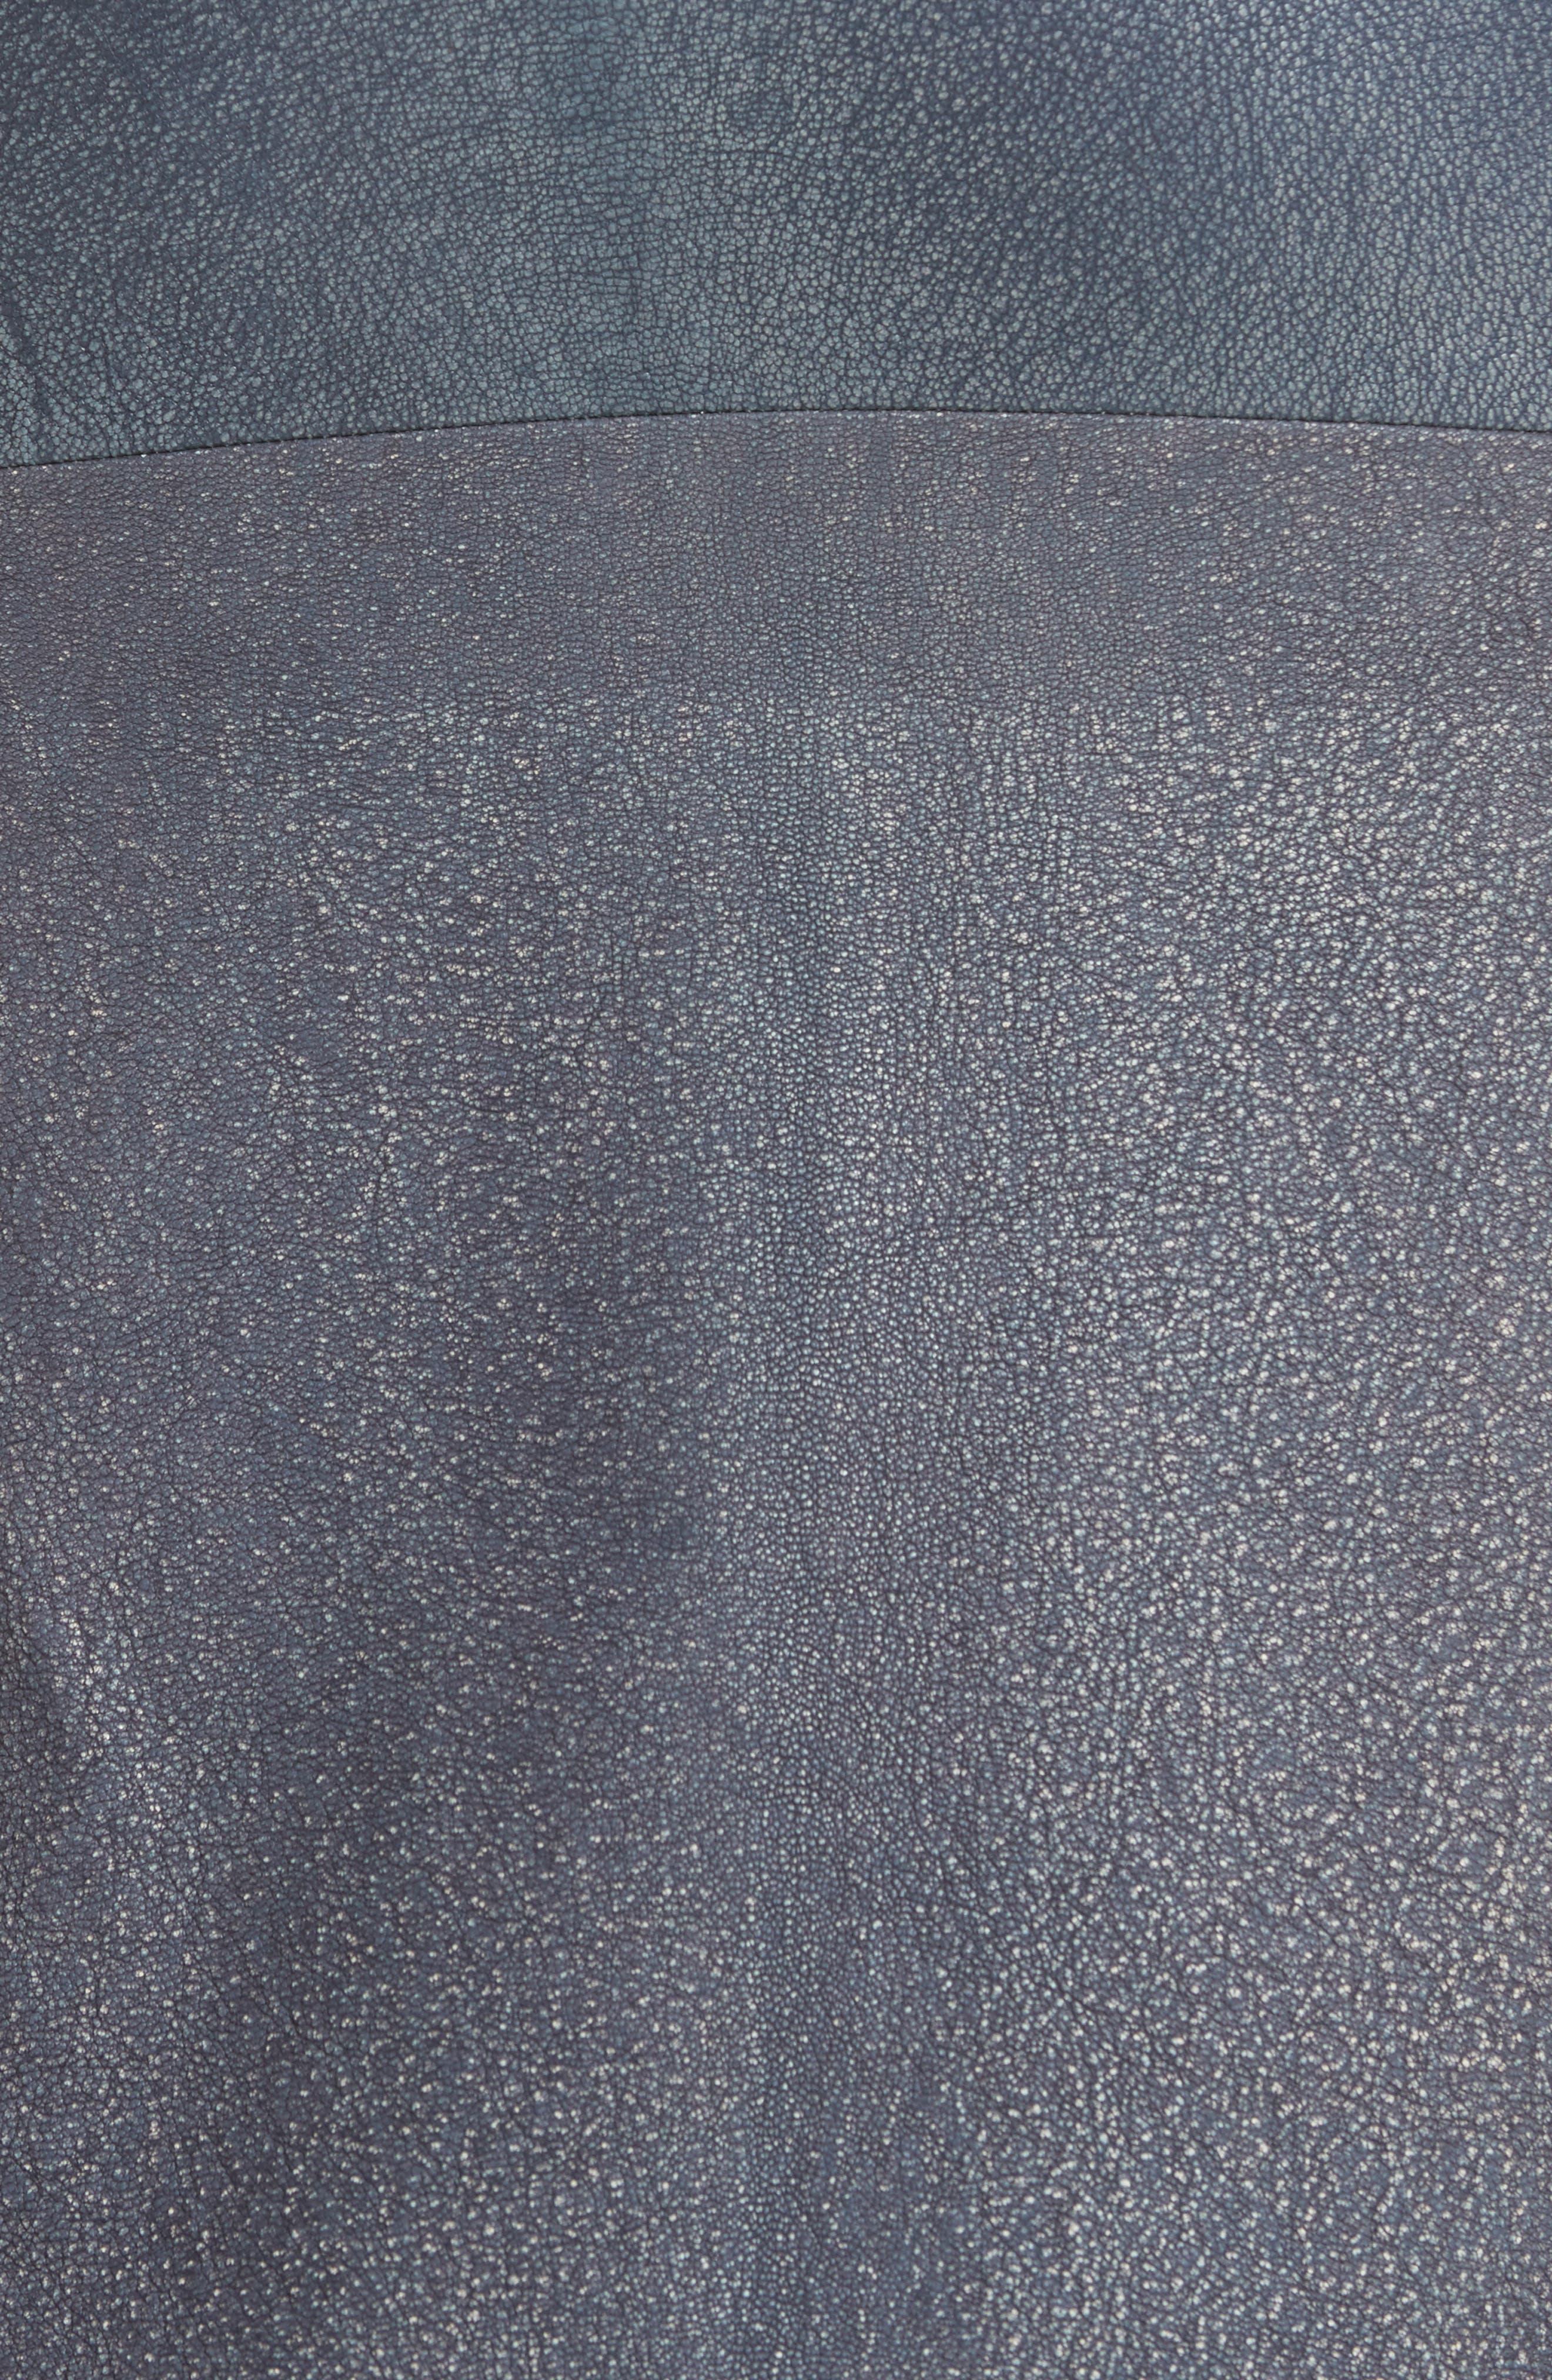 Alternate Image 3  - Zero + Maria Cornejo Rai Leather Curved Skirt